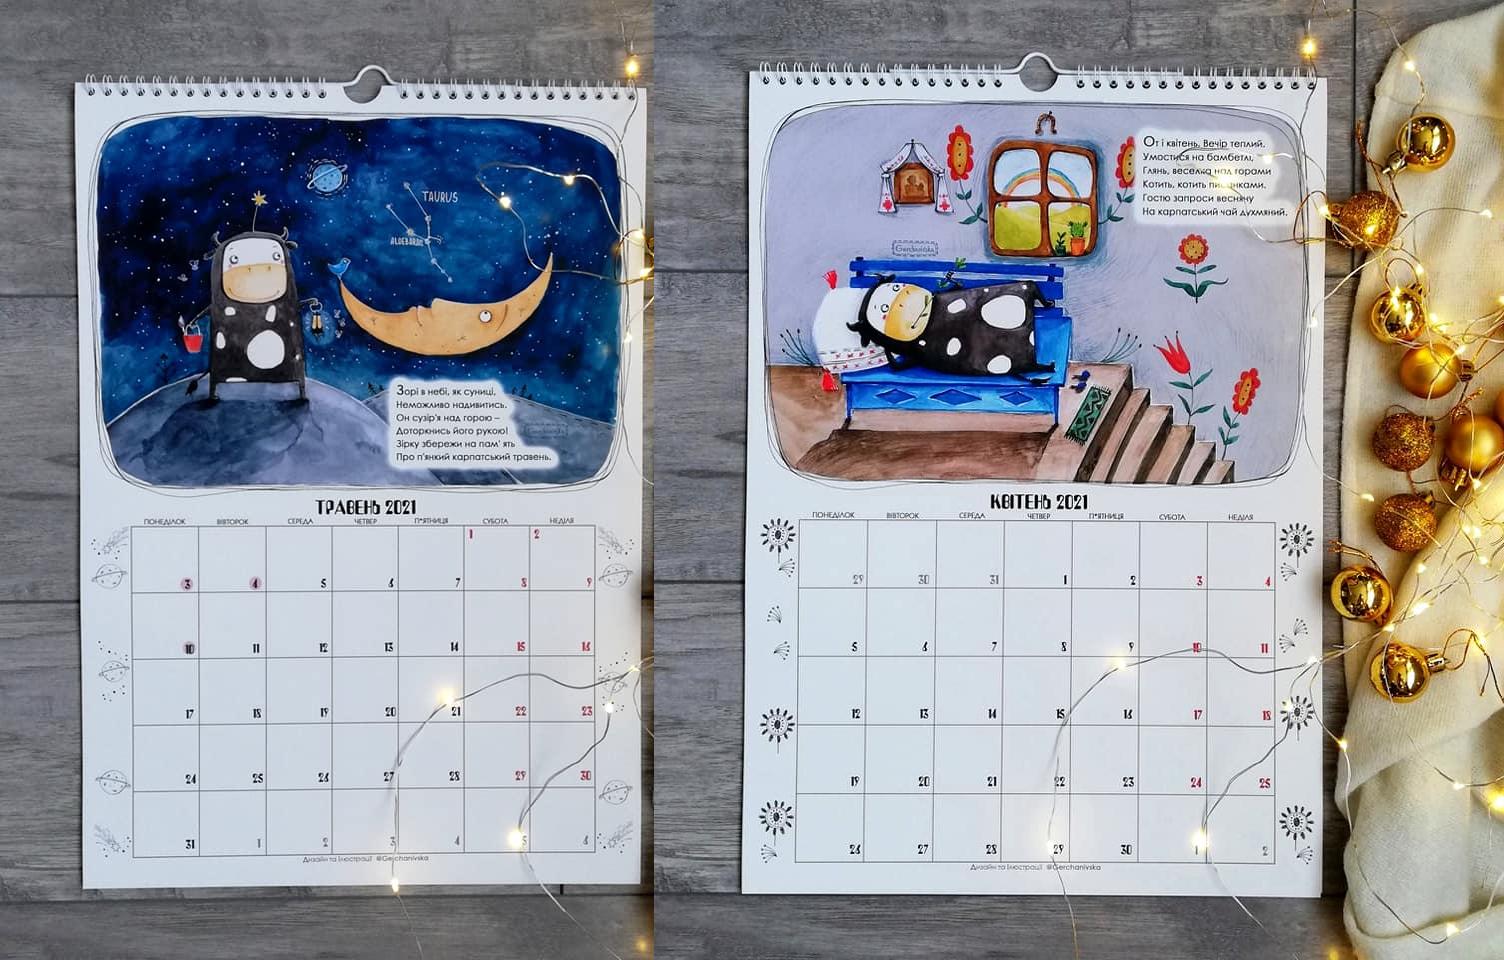 Герчанівська календар бичок